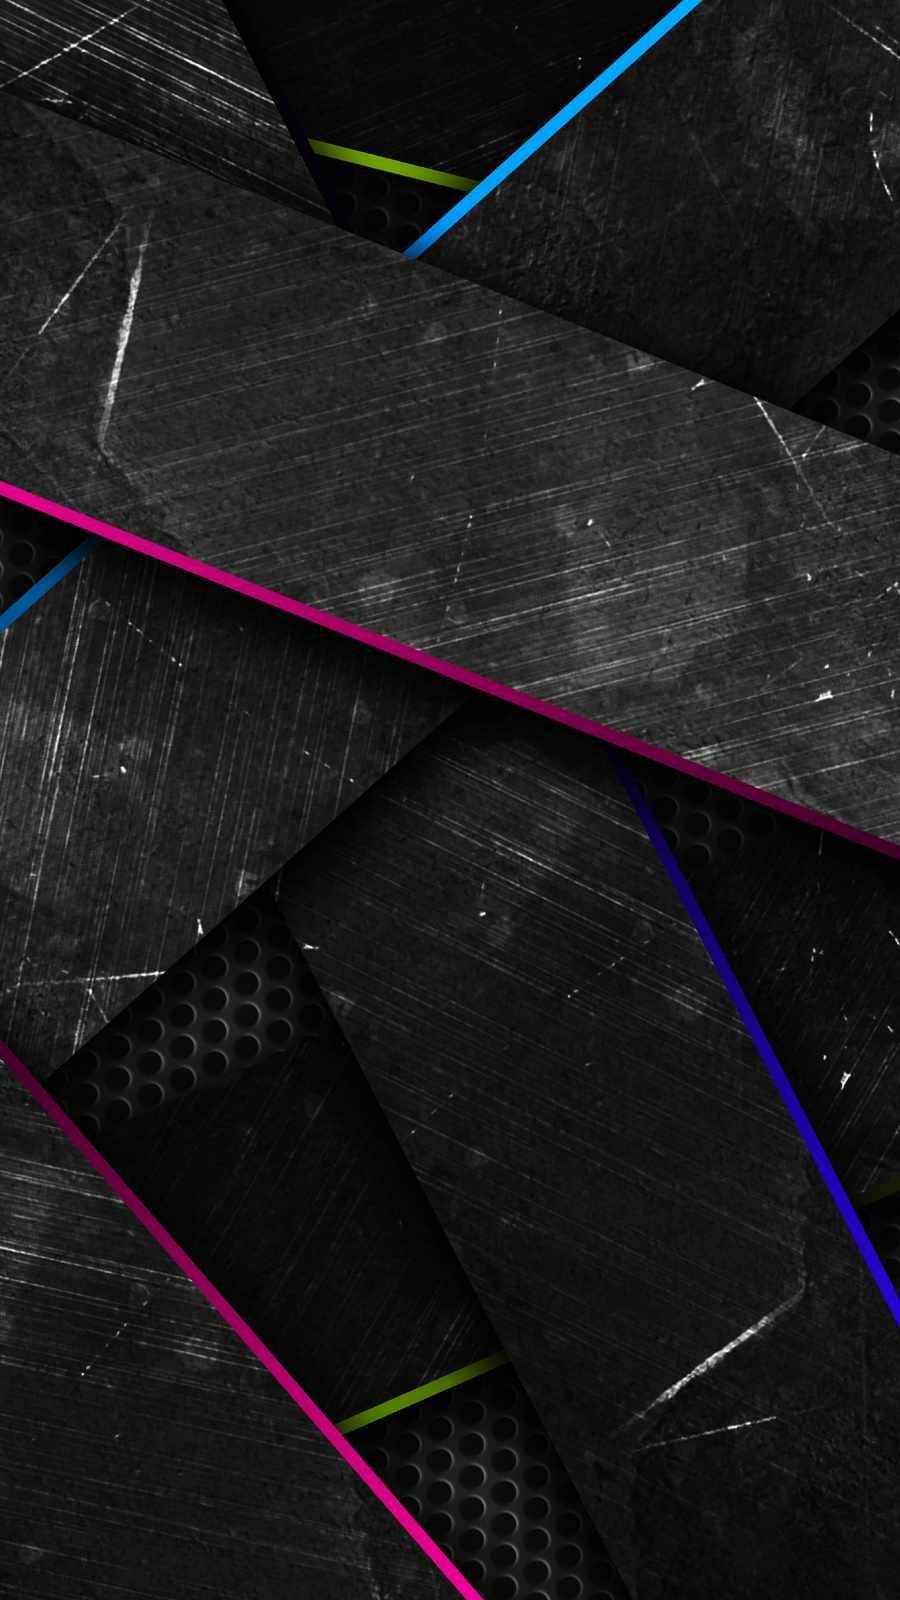 Rough Texture iPhone Wallpaper